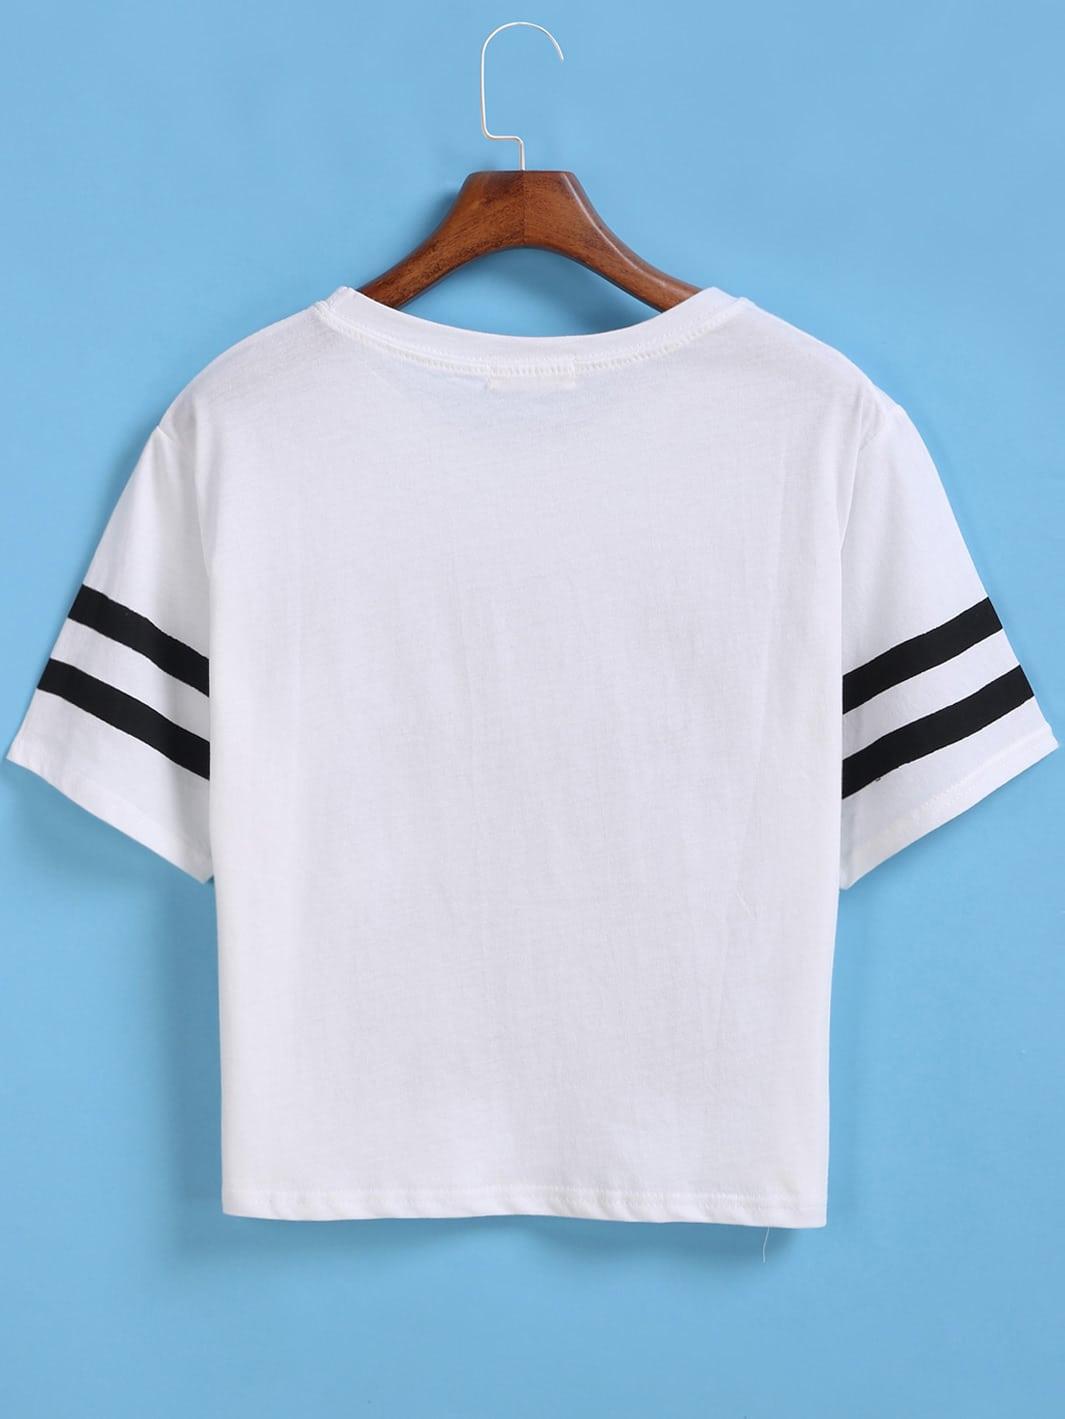 White t shirt crop top - White T Shirt Crop Top 26